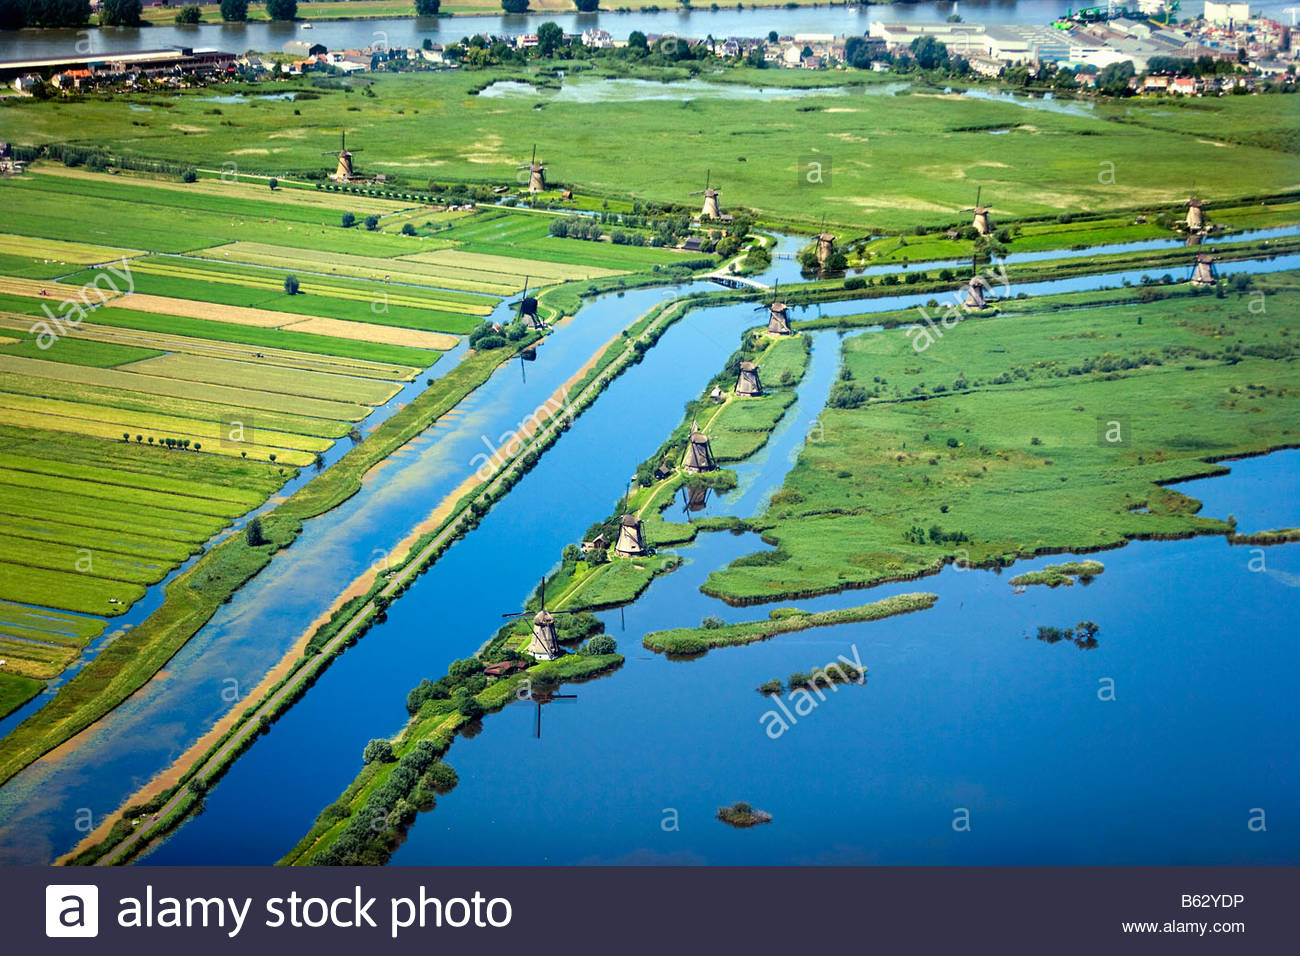 Netherlands Zuid Holland Kinderdijk Windmills in polder Unesco World Heritage Site Aerial - Stock Image